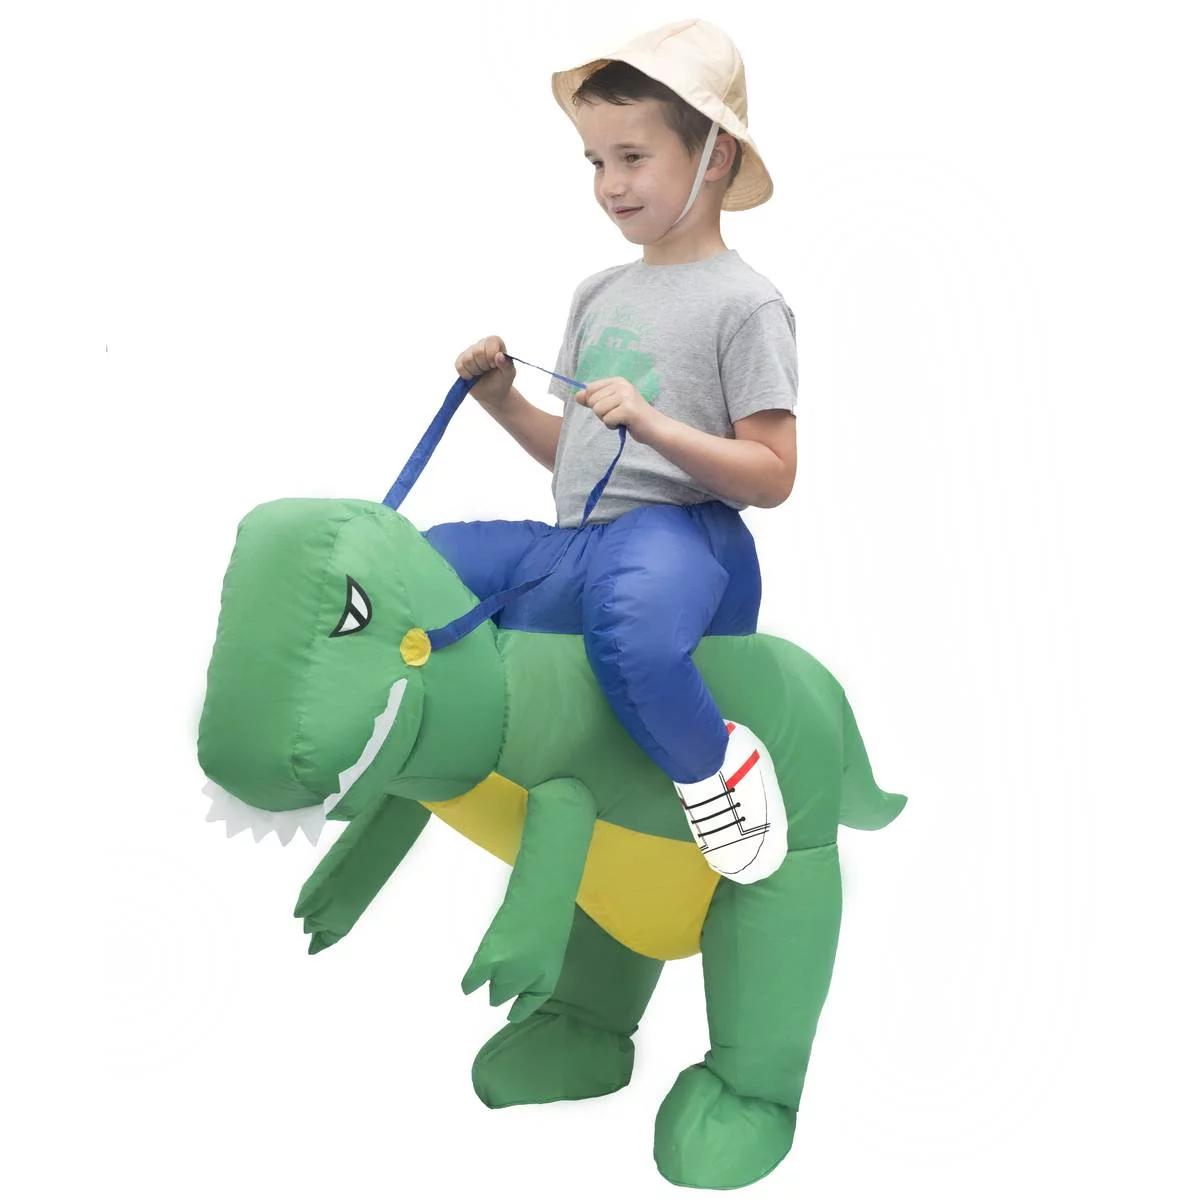 Kids Inflatable Dinosaur or Unicorn Costume now £16 Del w/code @ Hobbycraft (  sc 1 st  HotUKDeals & Kids Inflatable Dinosaur or Unicorn Costume now £16 Del w/code ...